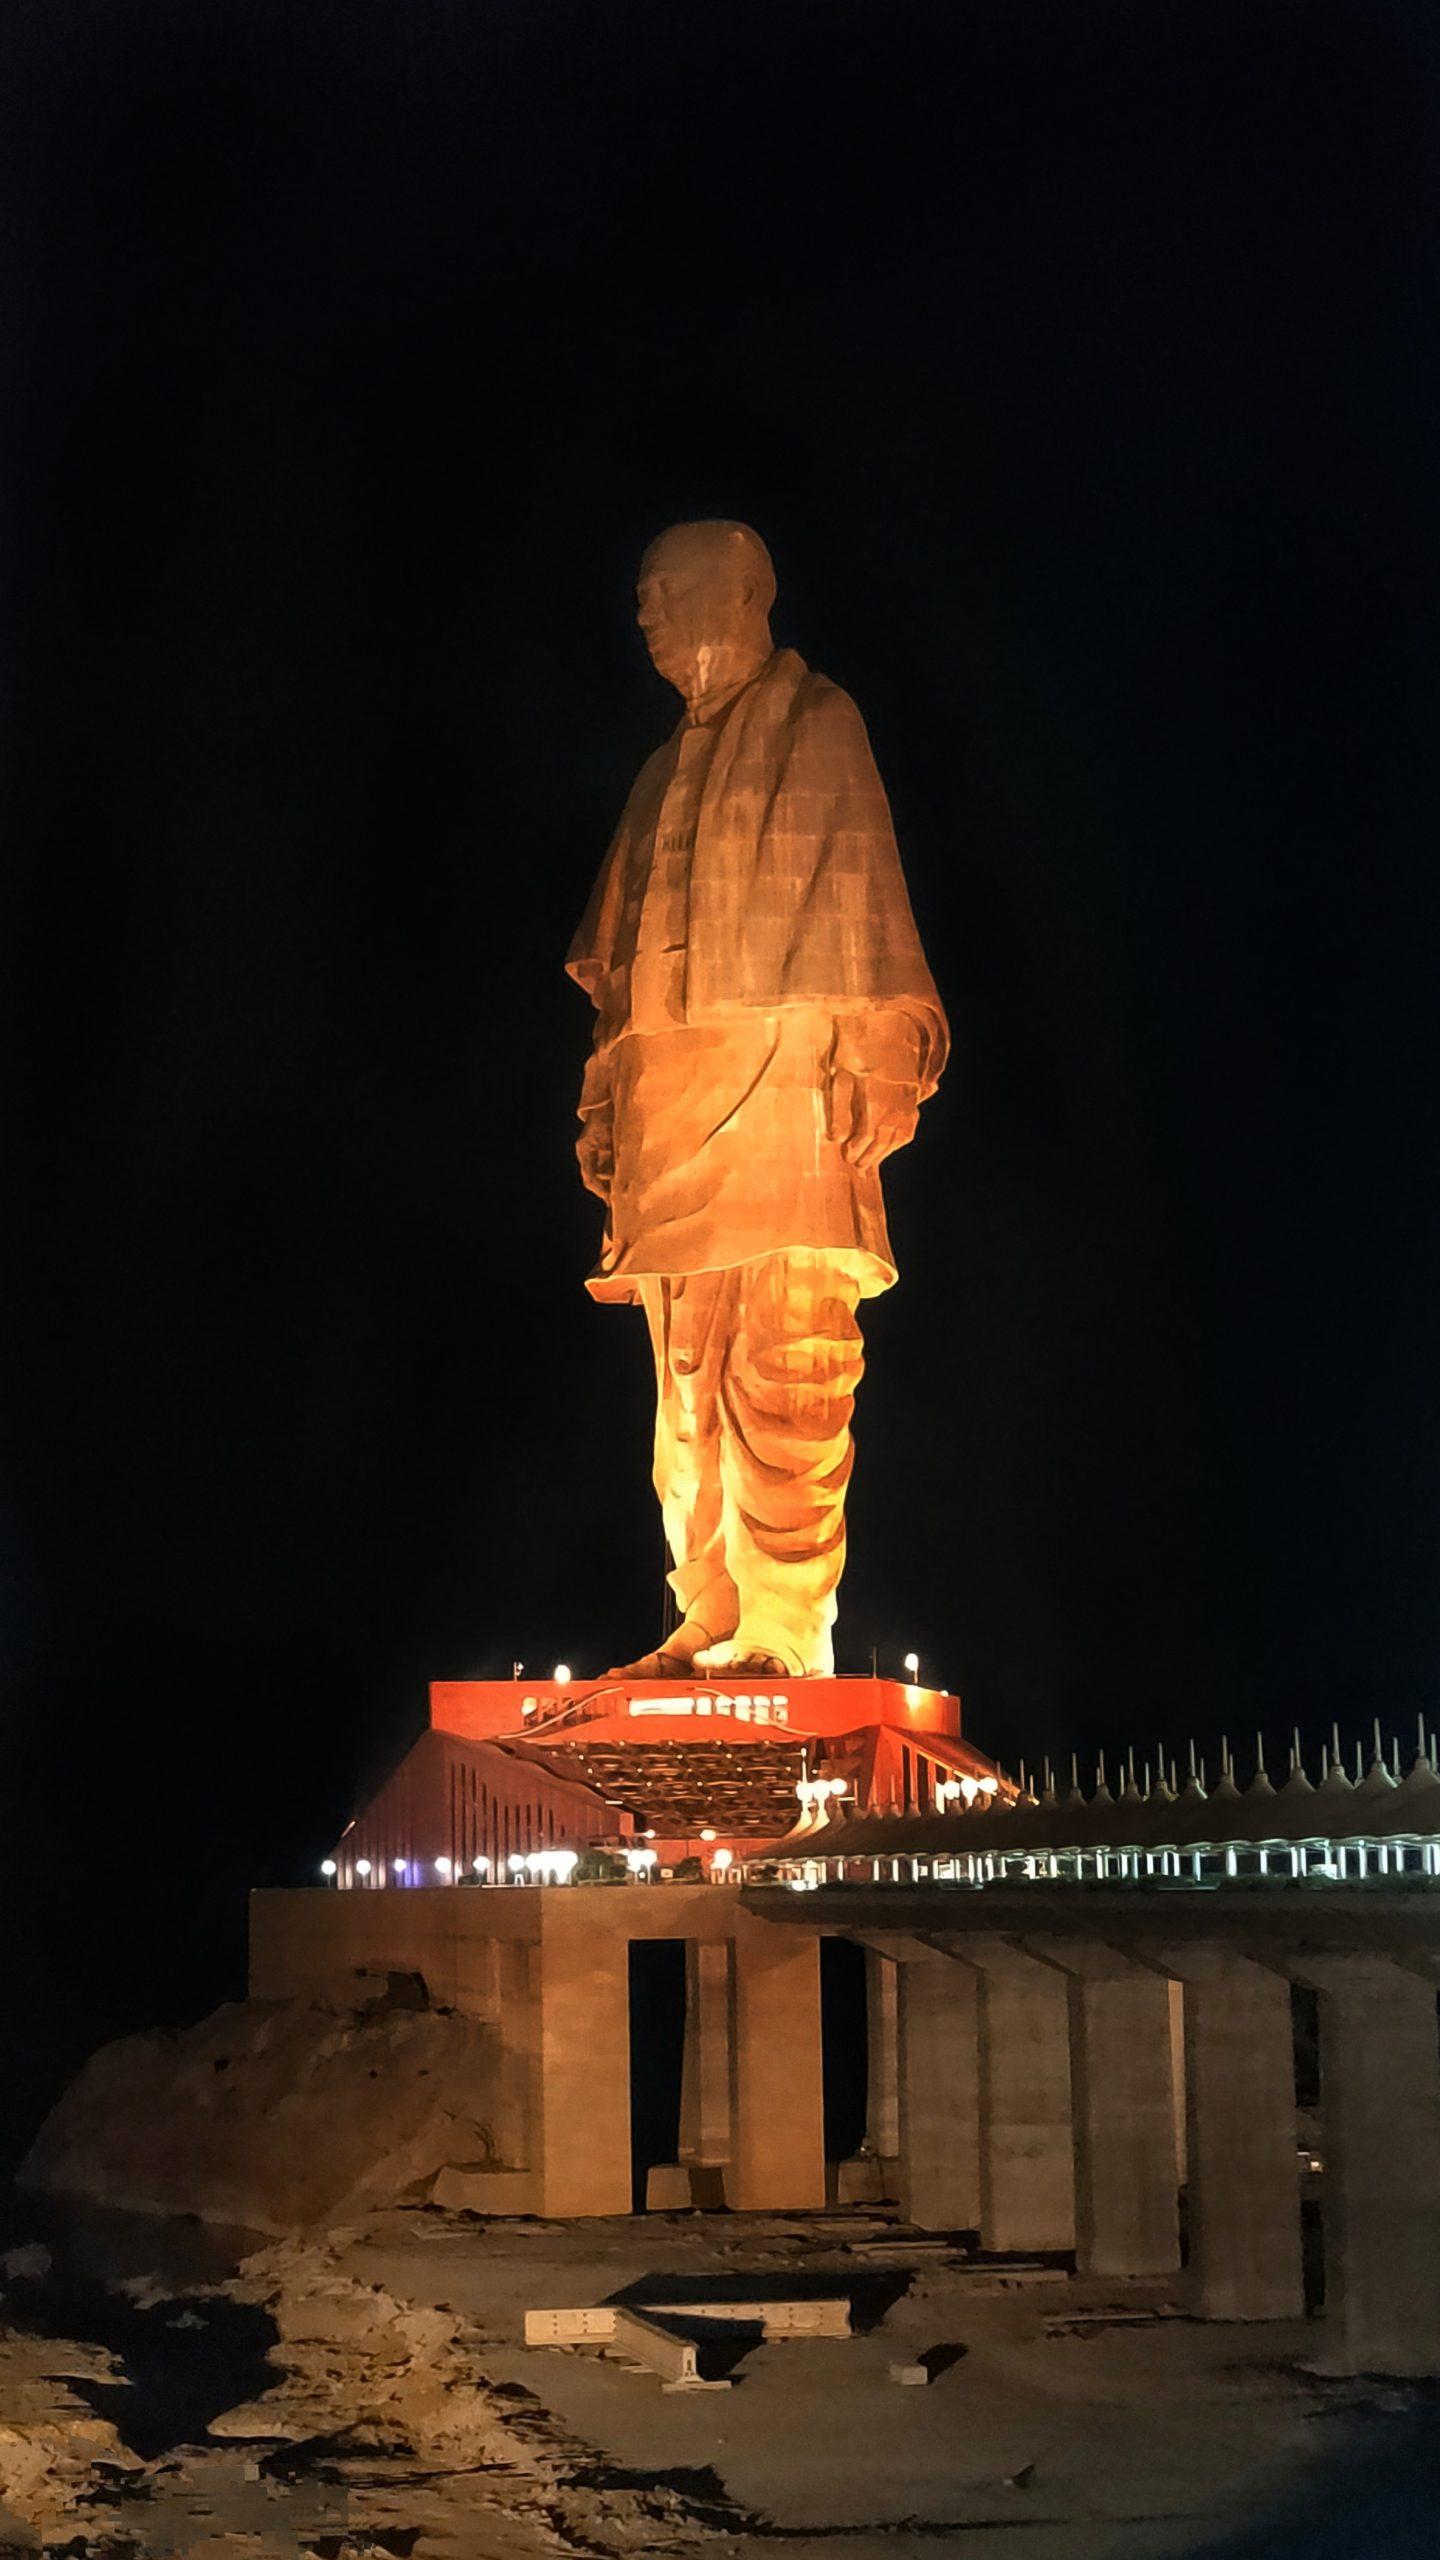 Statue of unite lighten up